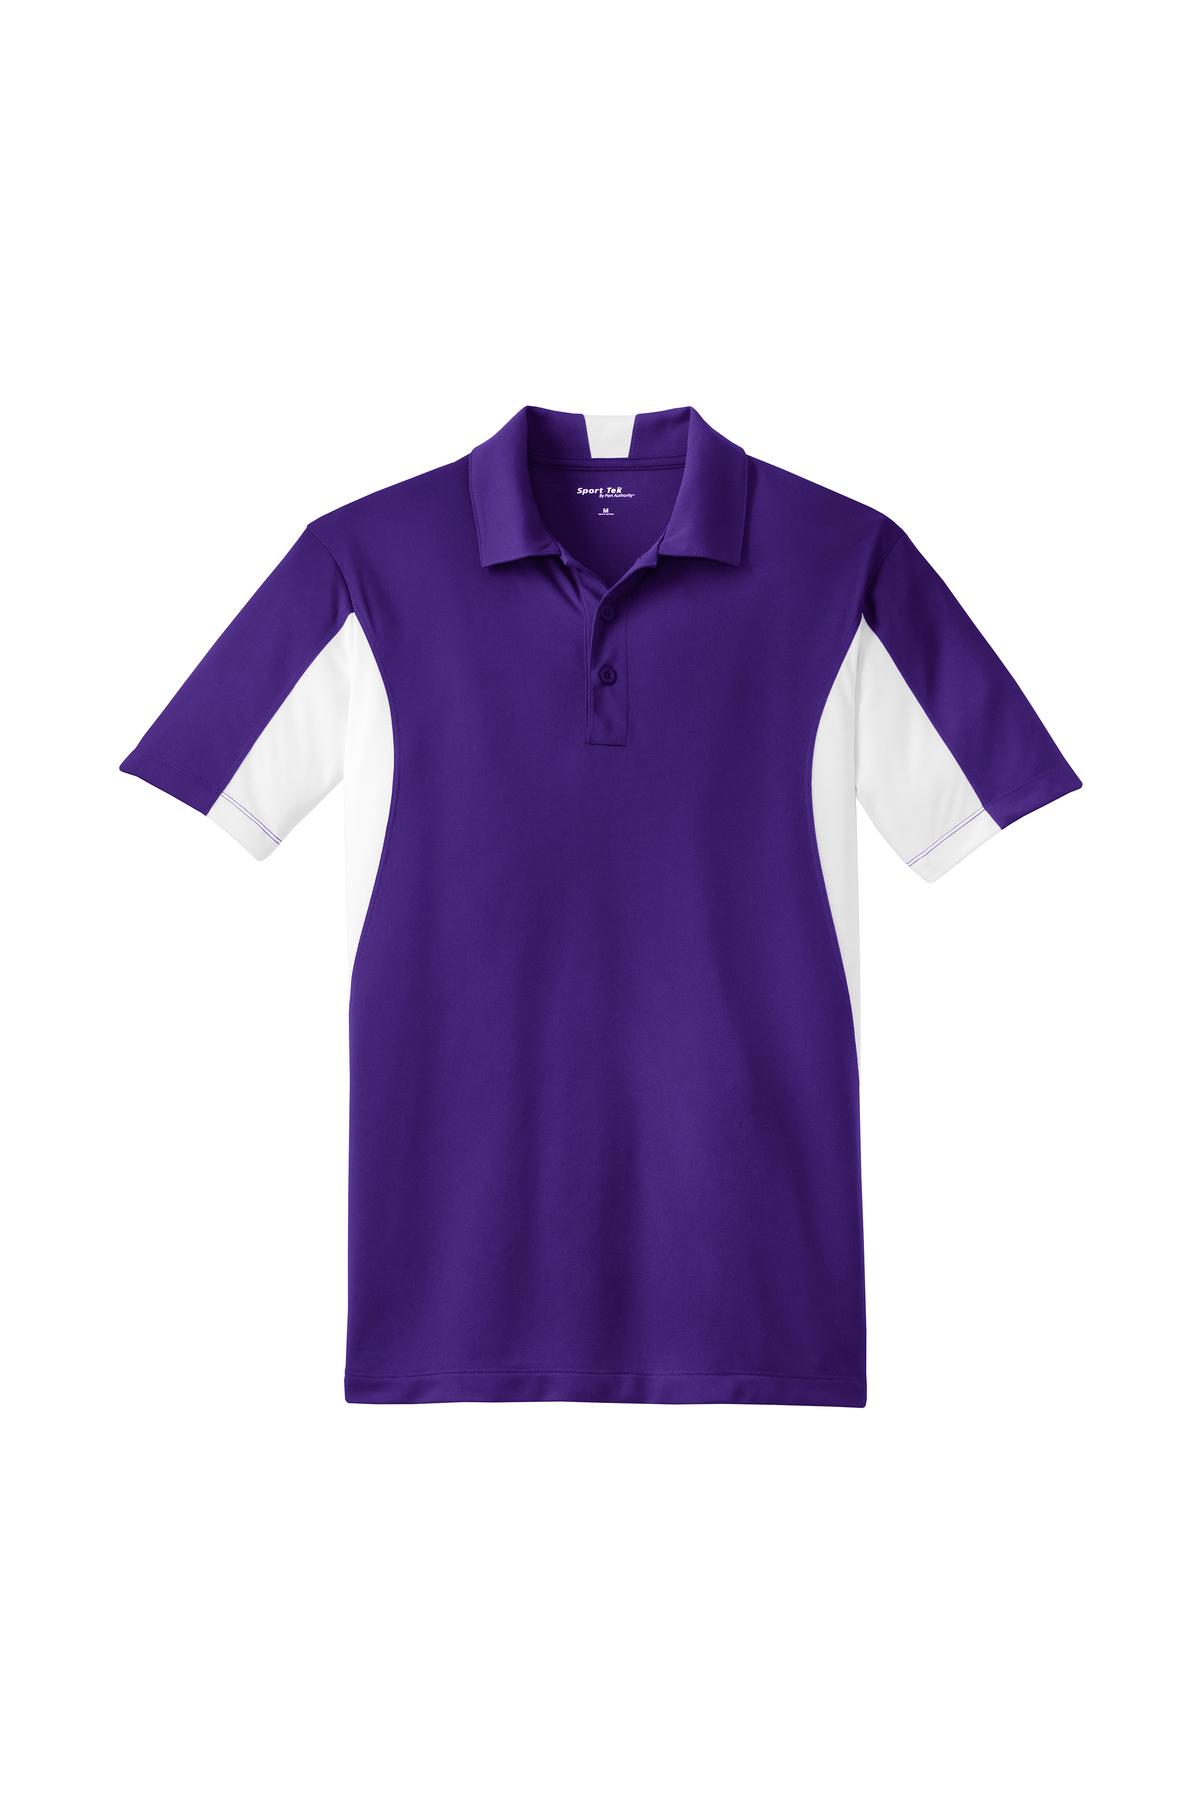 Sport-Tek Ladies Side Blocked Micropique Sport-Wick Polo XS Purple//White